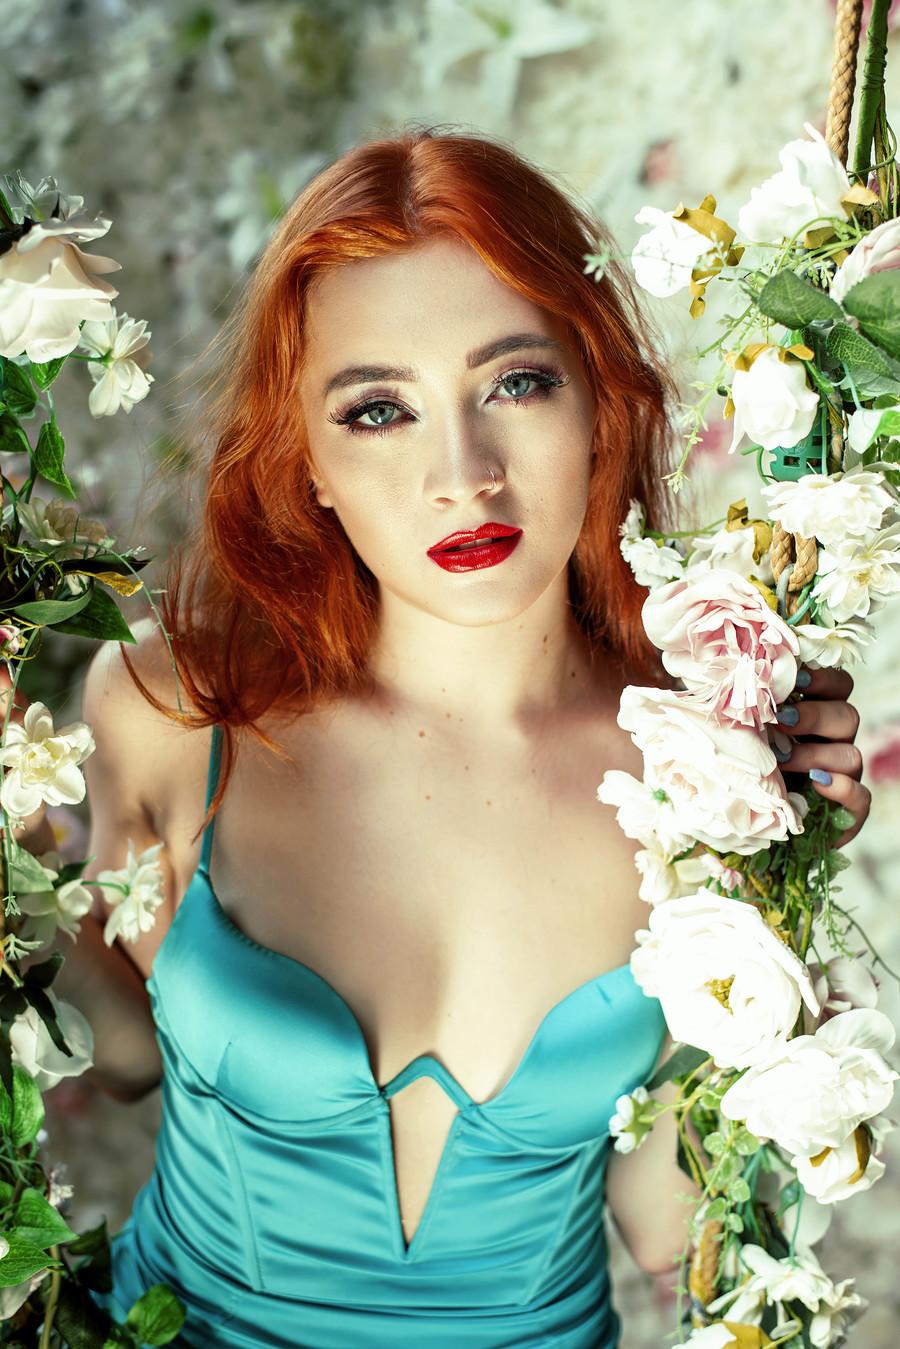 flowers / Photography by Vassili, Model bethnorris21, Taken at Montrose Studio / Uploaded 2nd September 2020 @ 08:55 PM